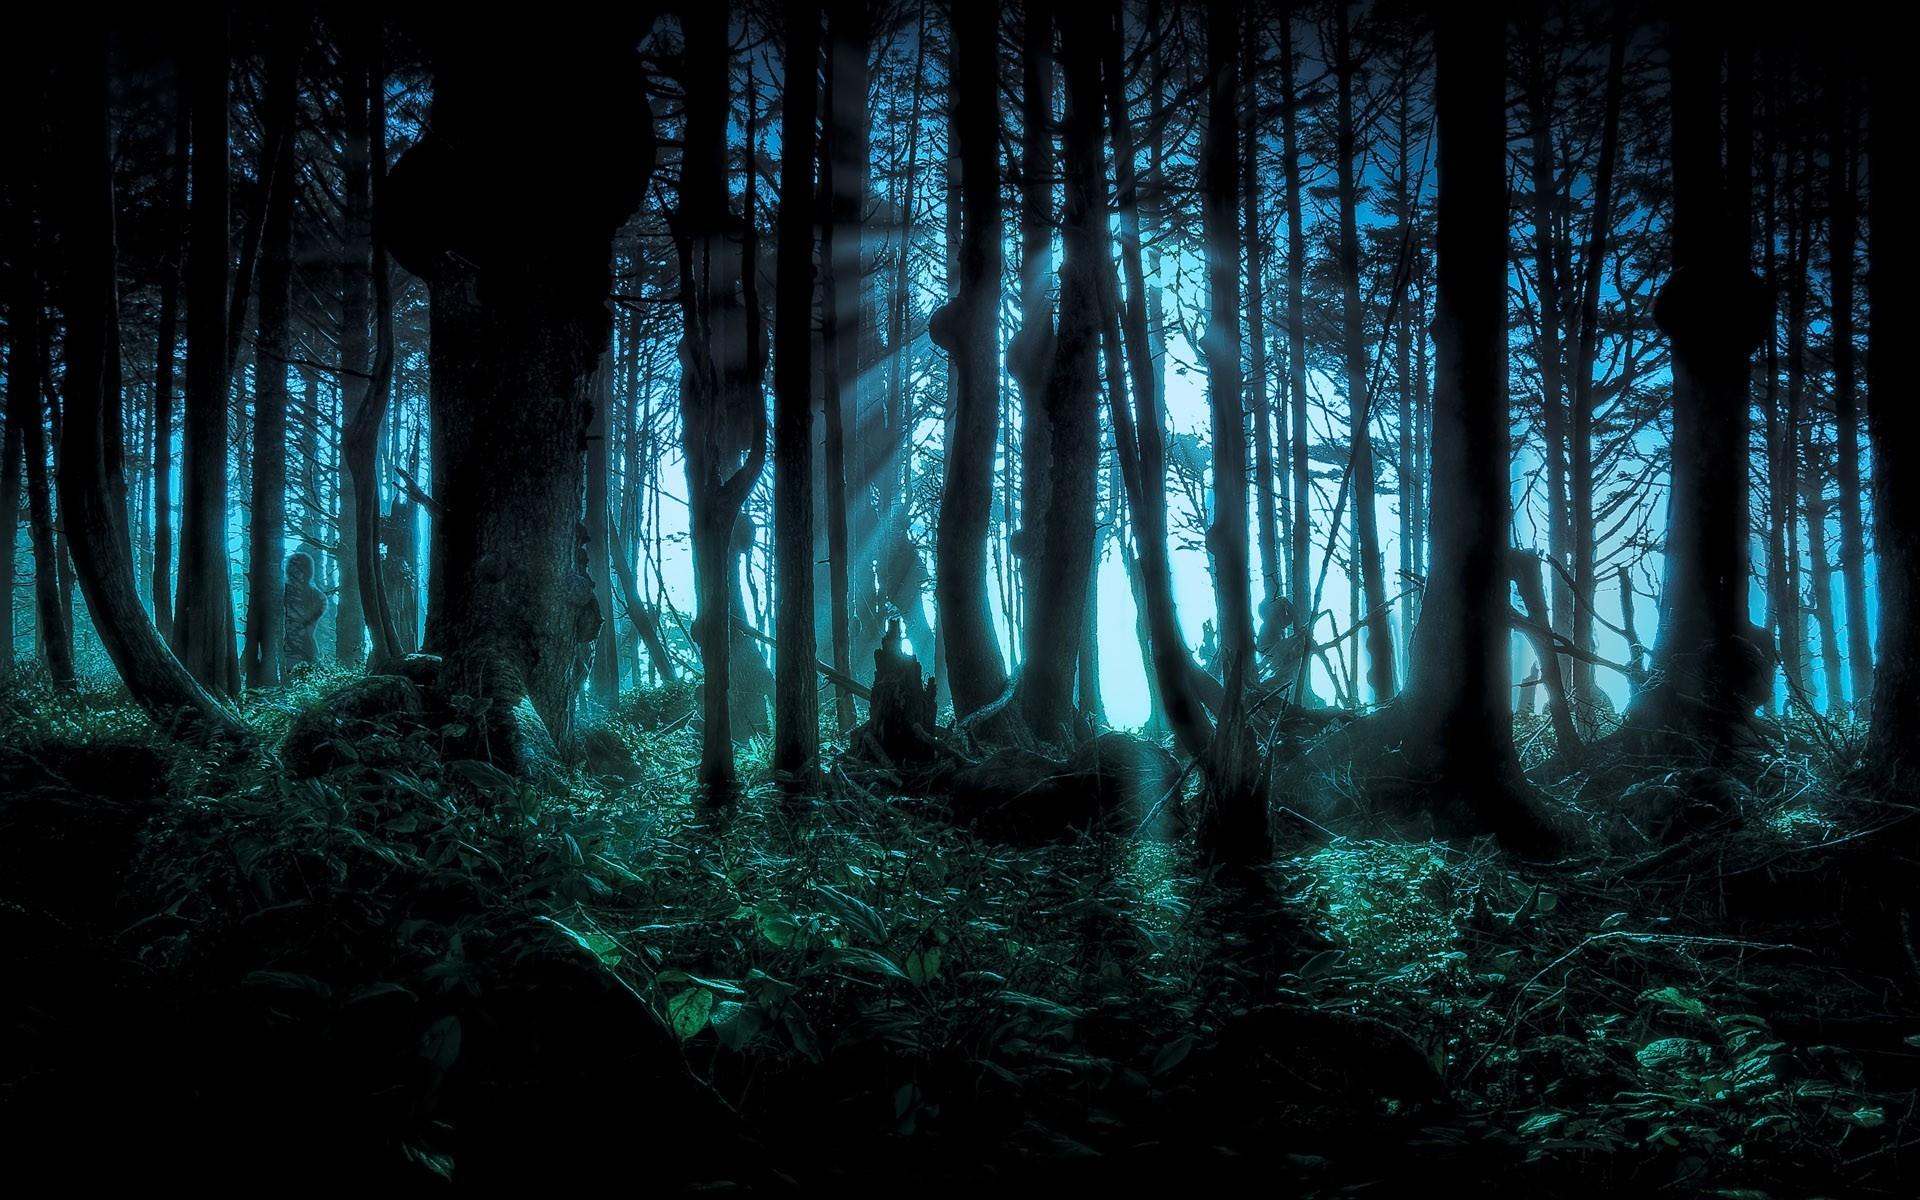 Spooky Forest — Backlit